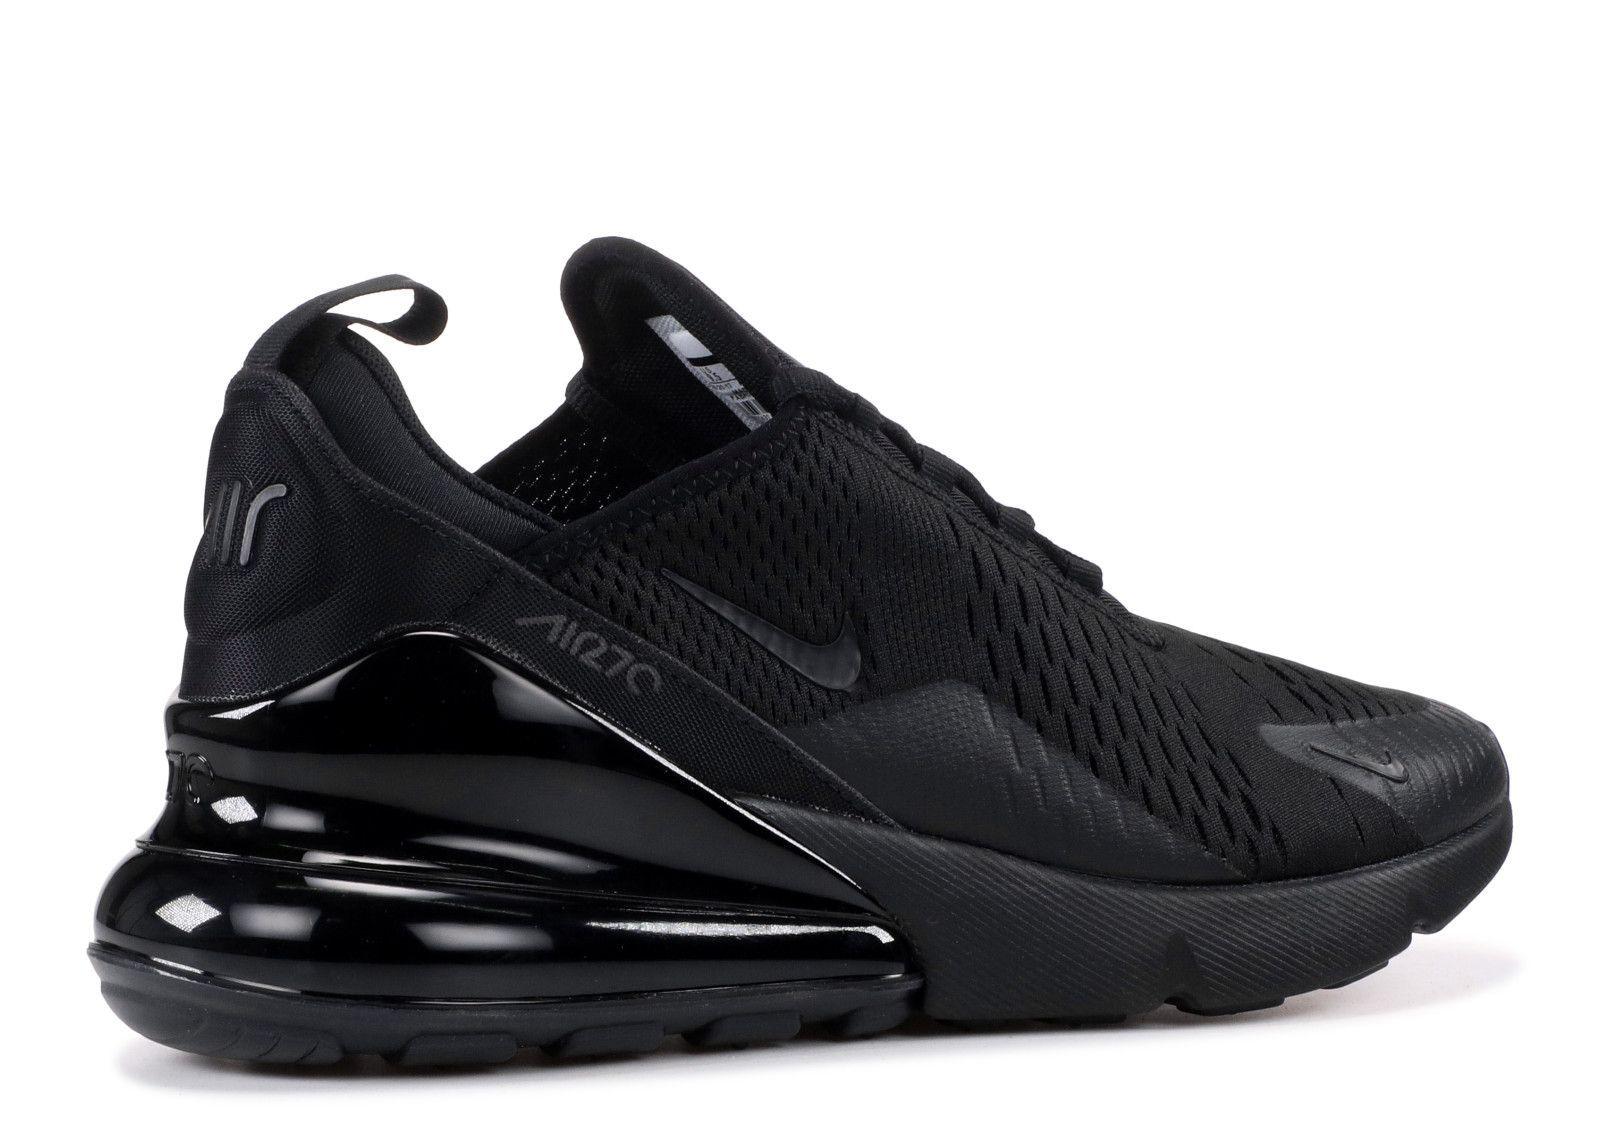 ... Nike AIR 27 C Black Running Shoes ...